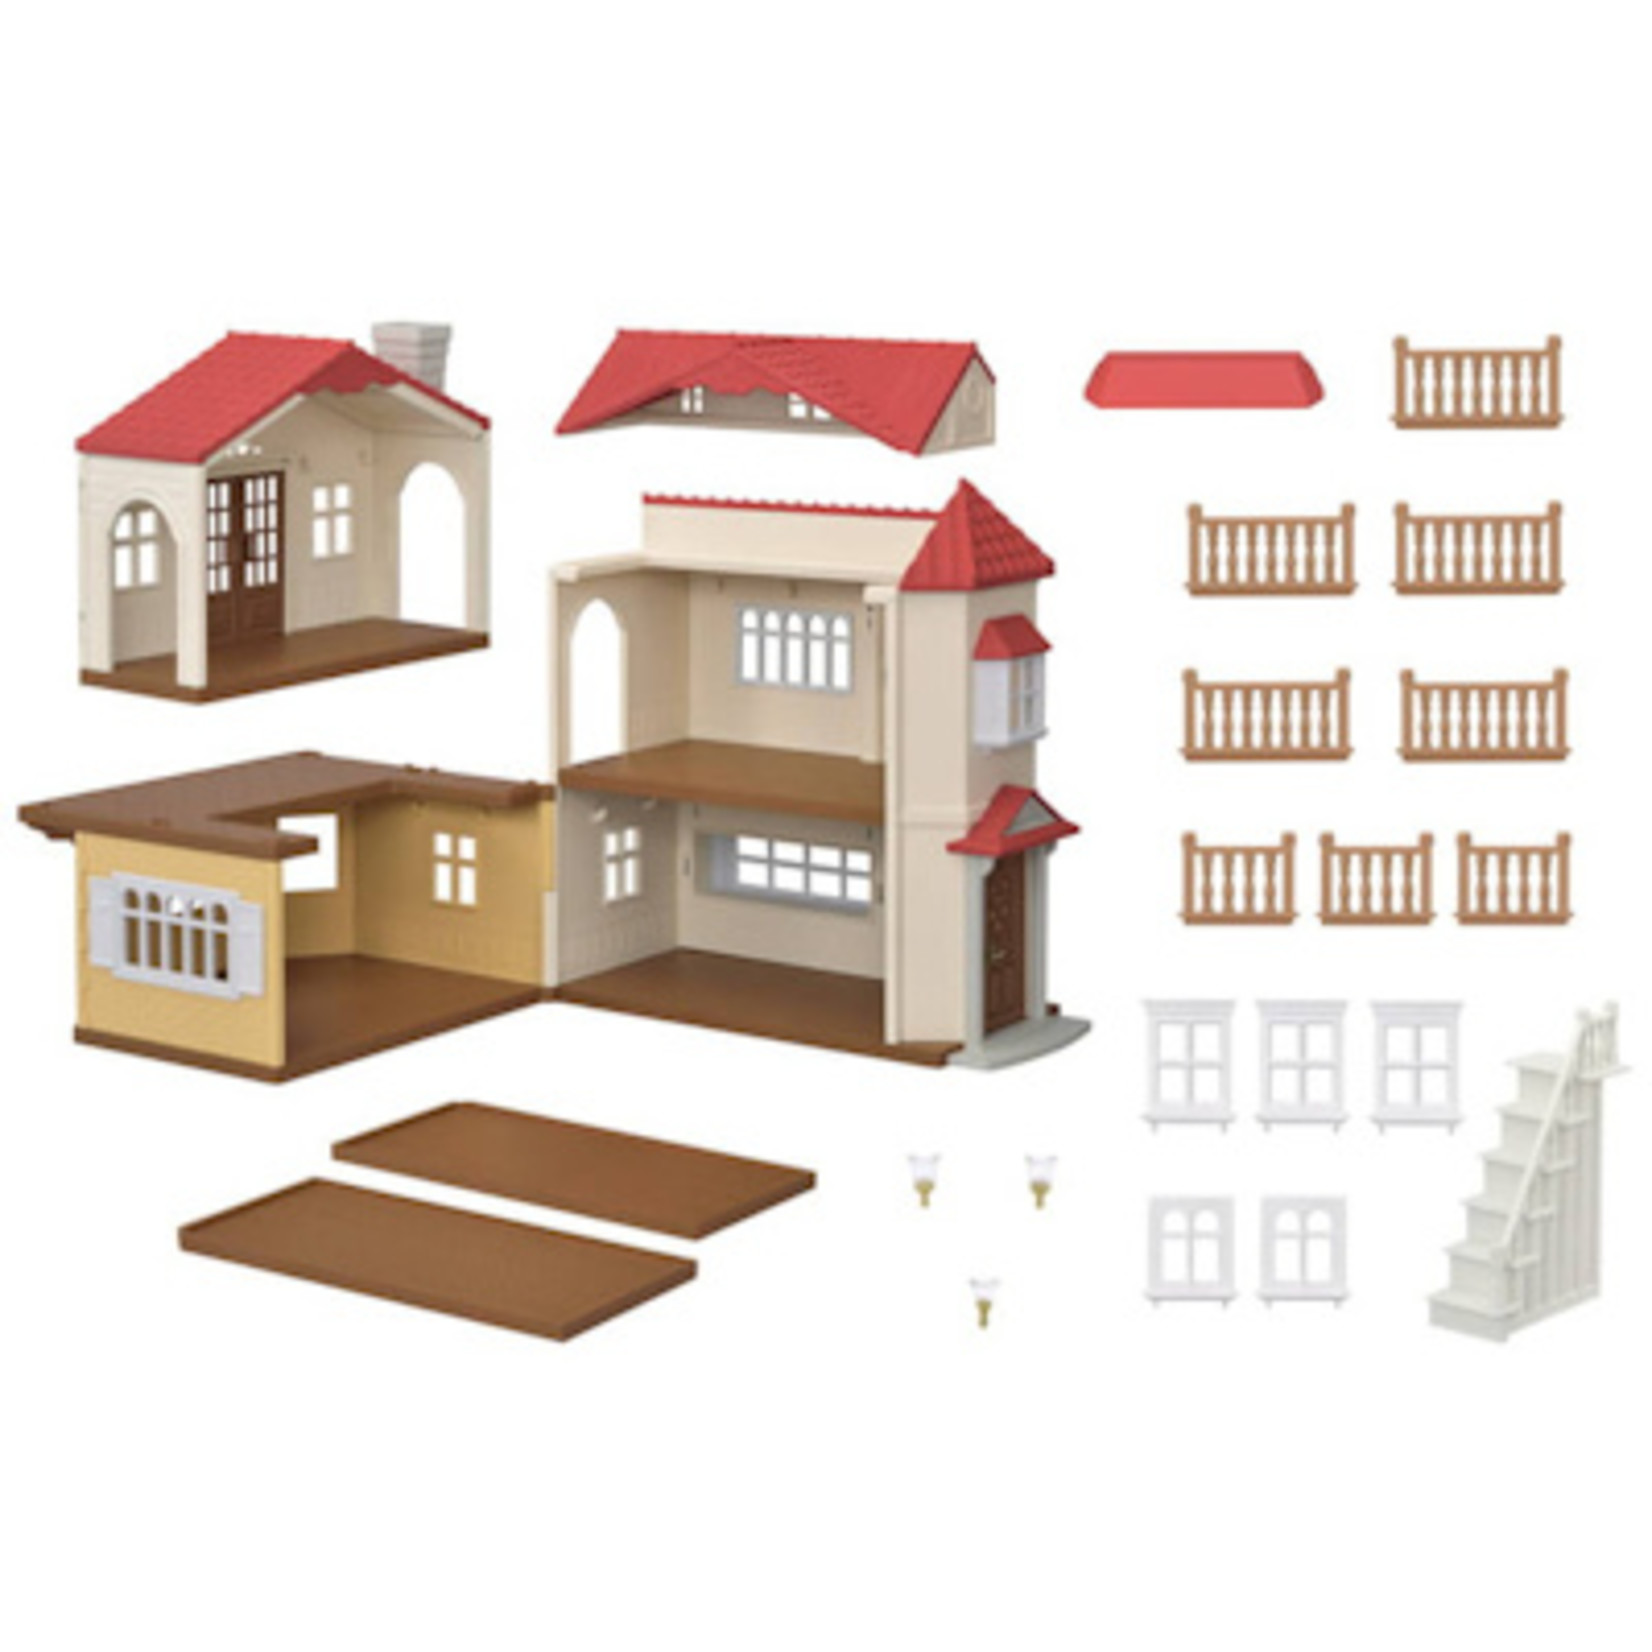 Sylvanian Families Landhuis met rood dak